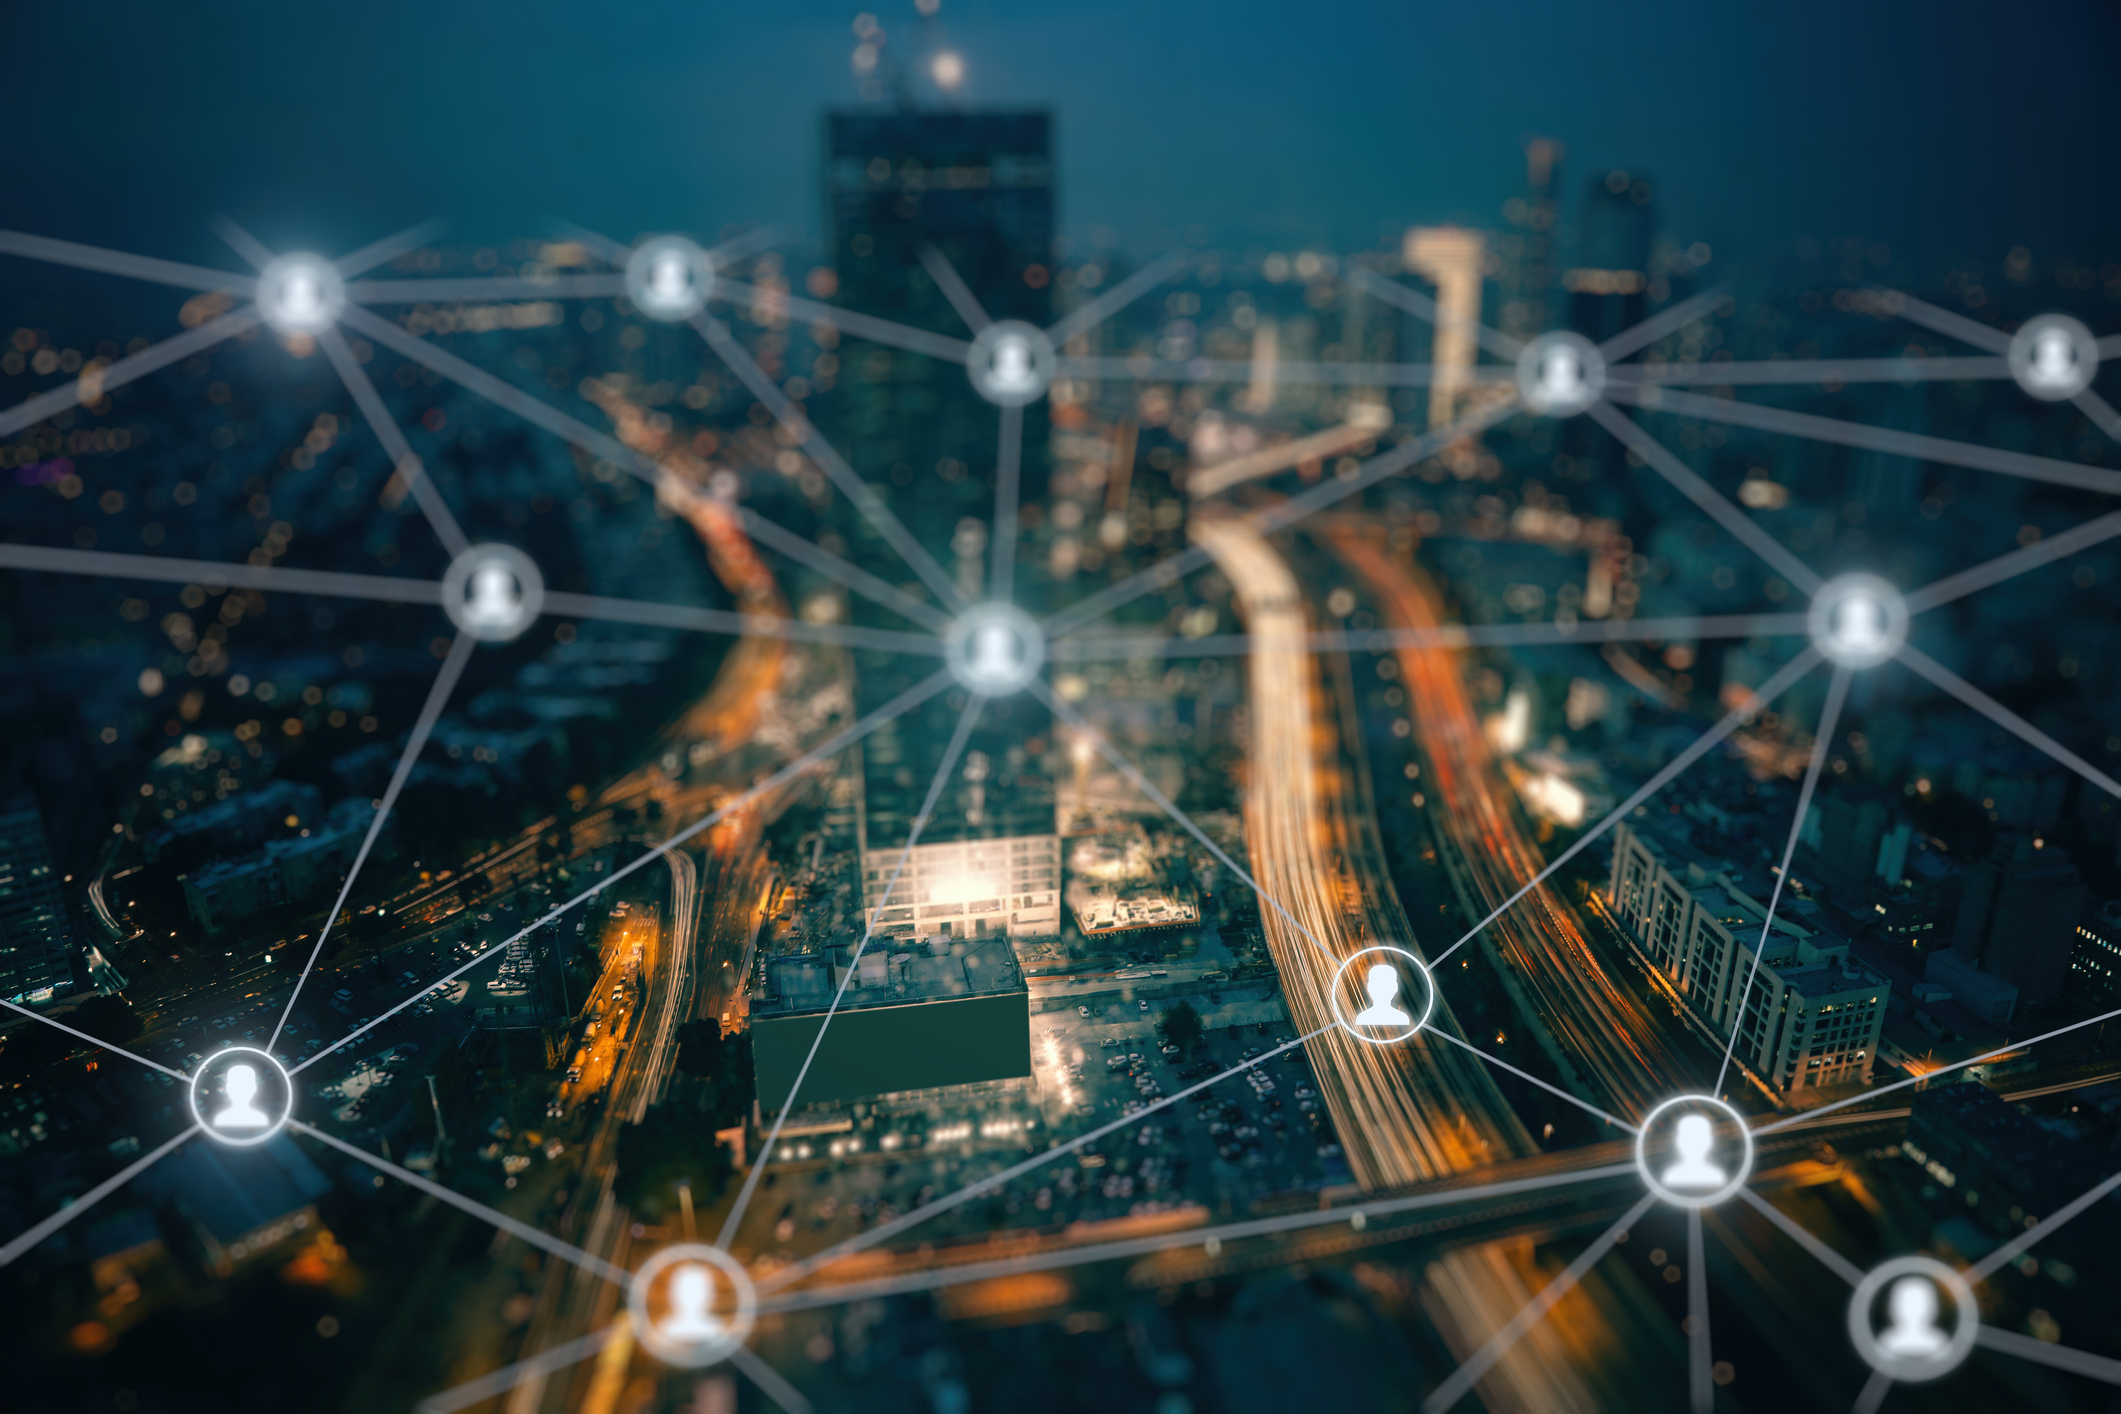 Gerent LLC Makes a Strategic Investment in DefinedLogic, Extending its Digital Transformation Capabilities